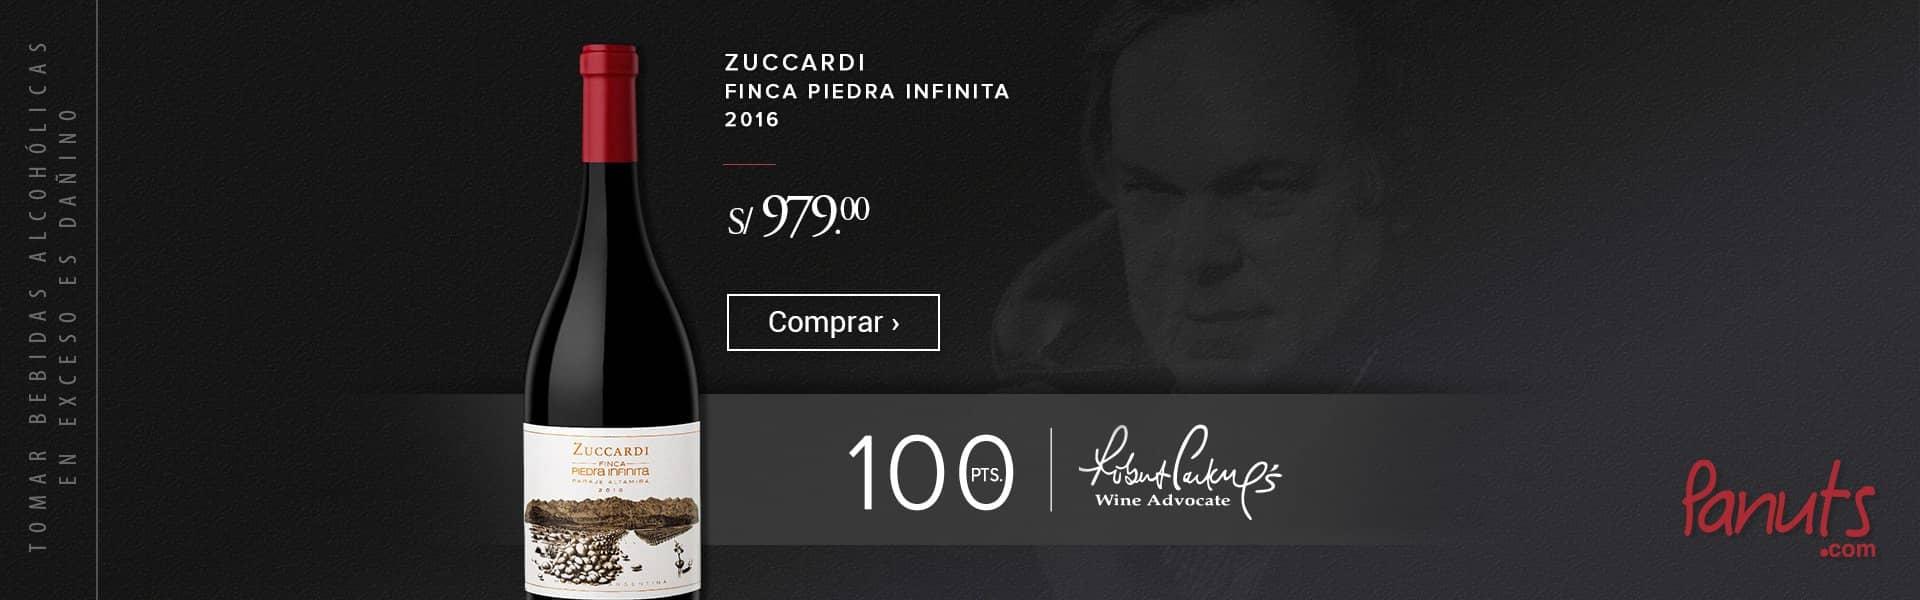 Zuccardi Piedra Infinita 2016